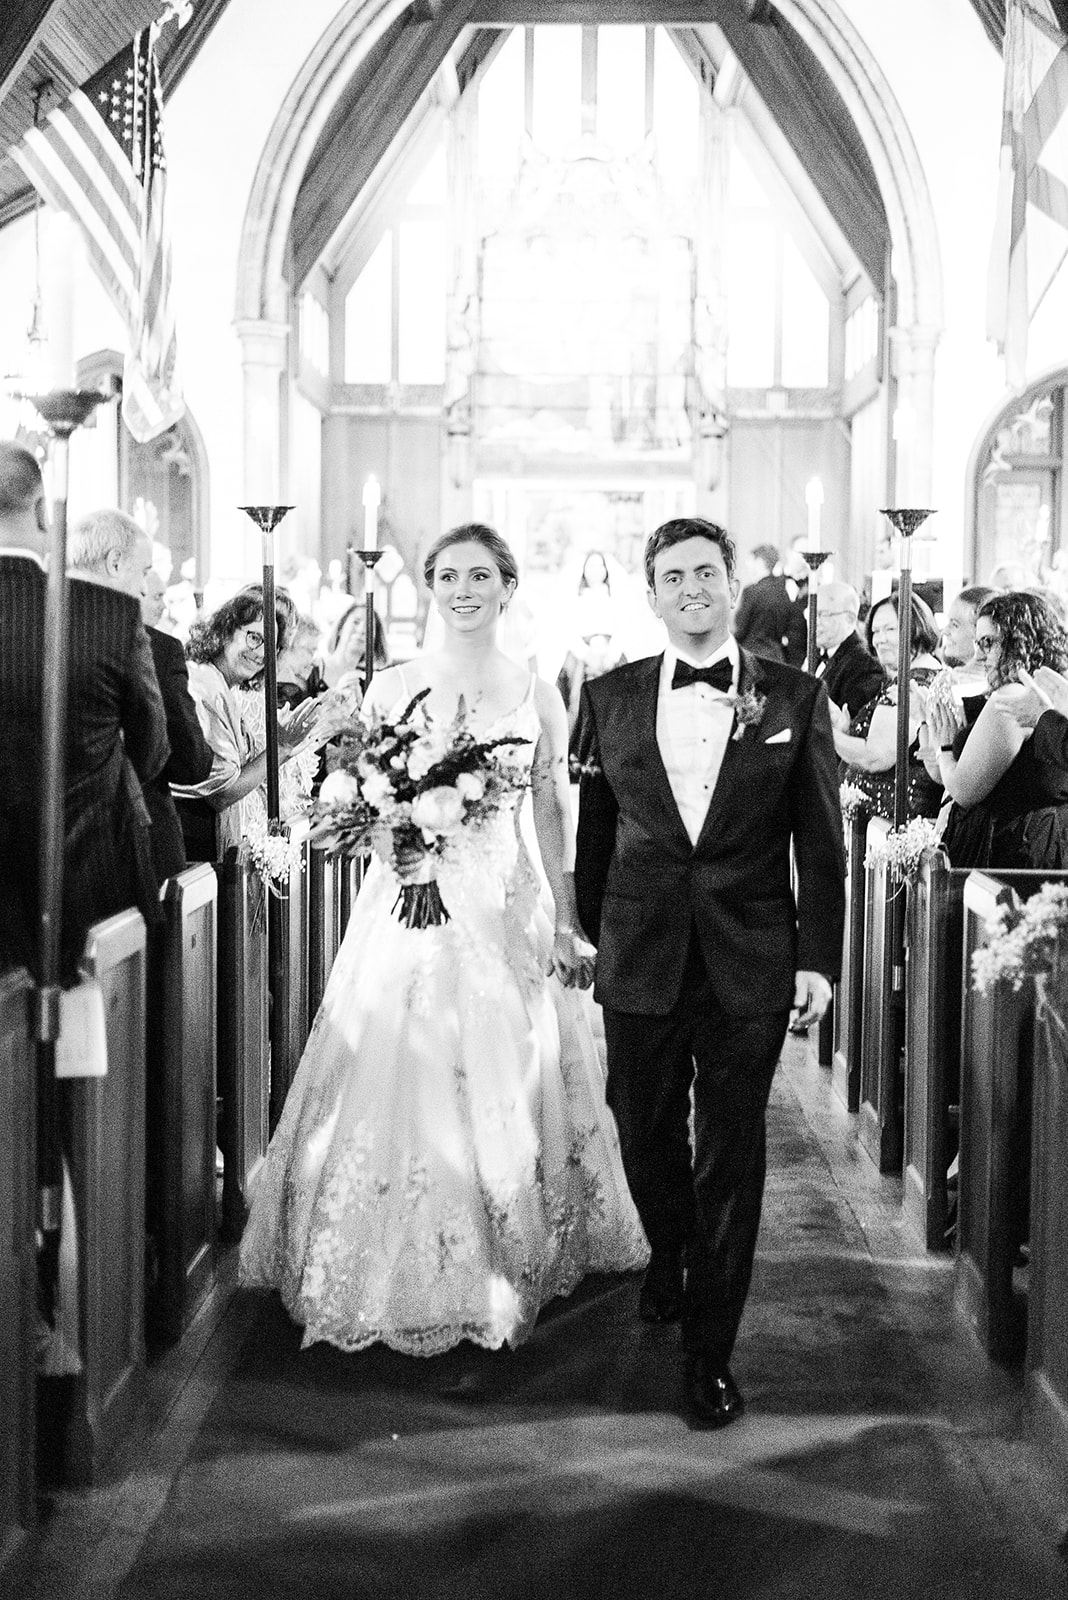 Lloyd+Wedding+by+Michelle+Lange+Photography-416.jpg